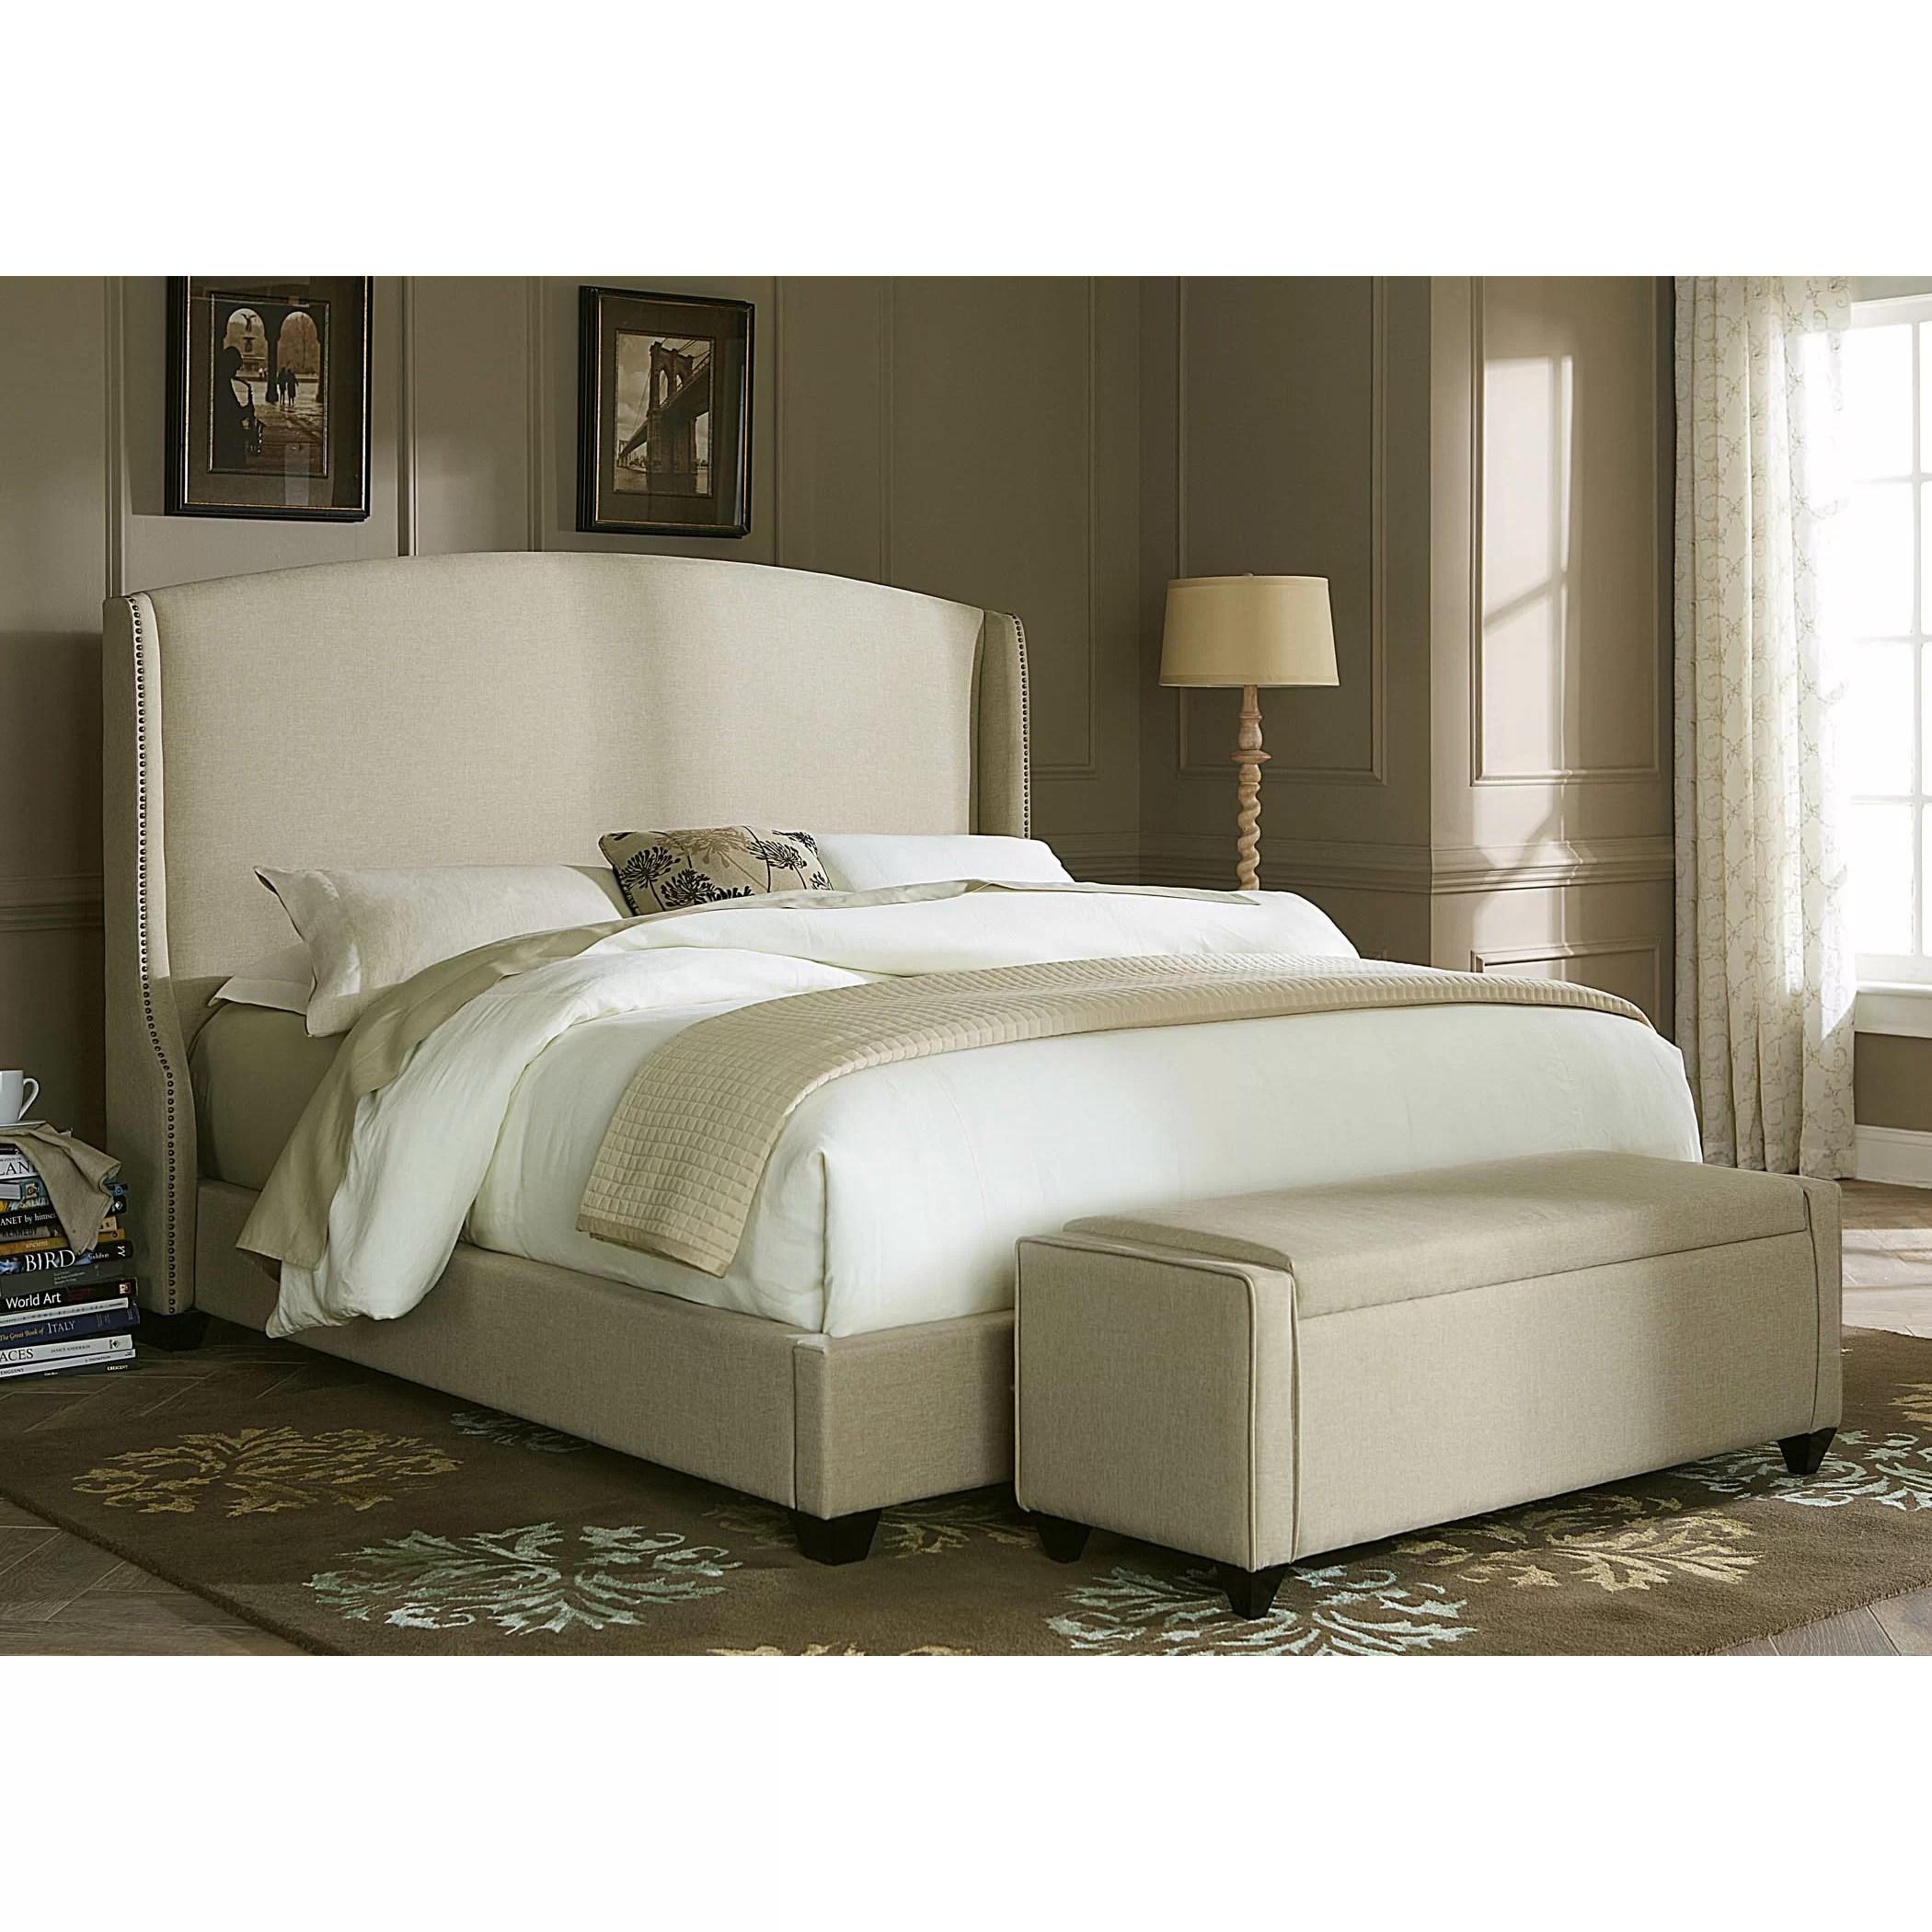 Liberty Furniture Upholstered Storage Bedroom Bench